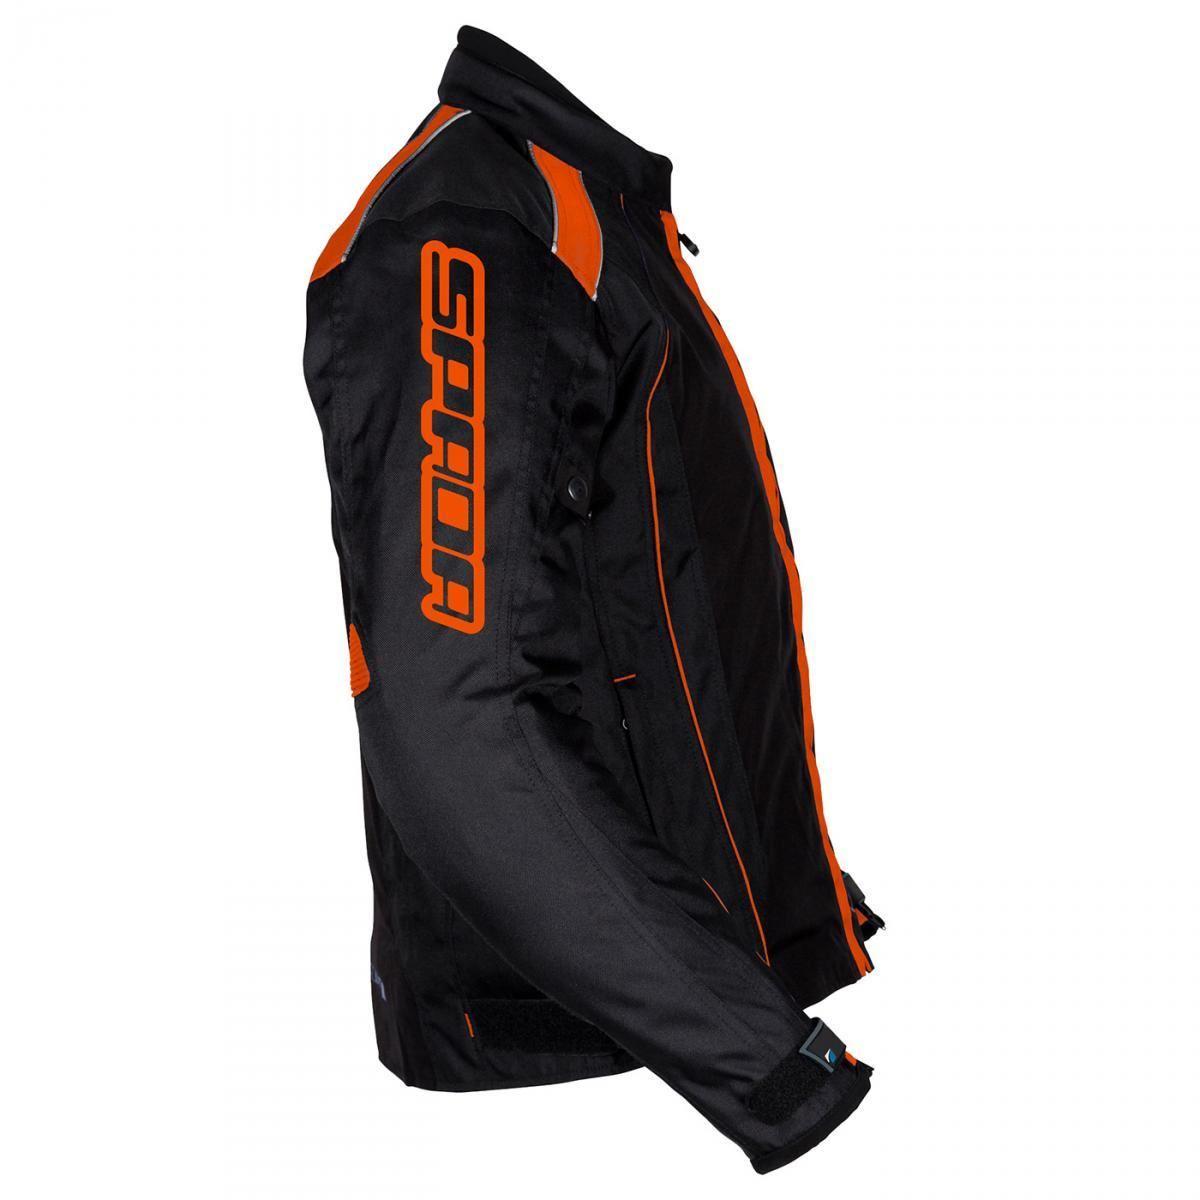 Spada-Plaza-Motorcycle-Jacket-Black-KTM-Orange-Waterproof-Thermal-M-2XL thumbnail 15